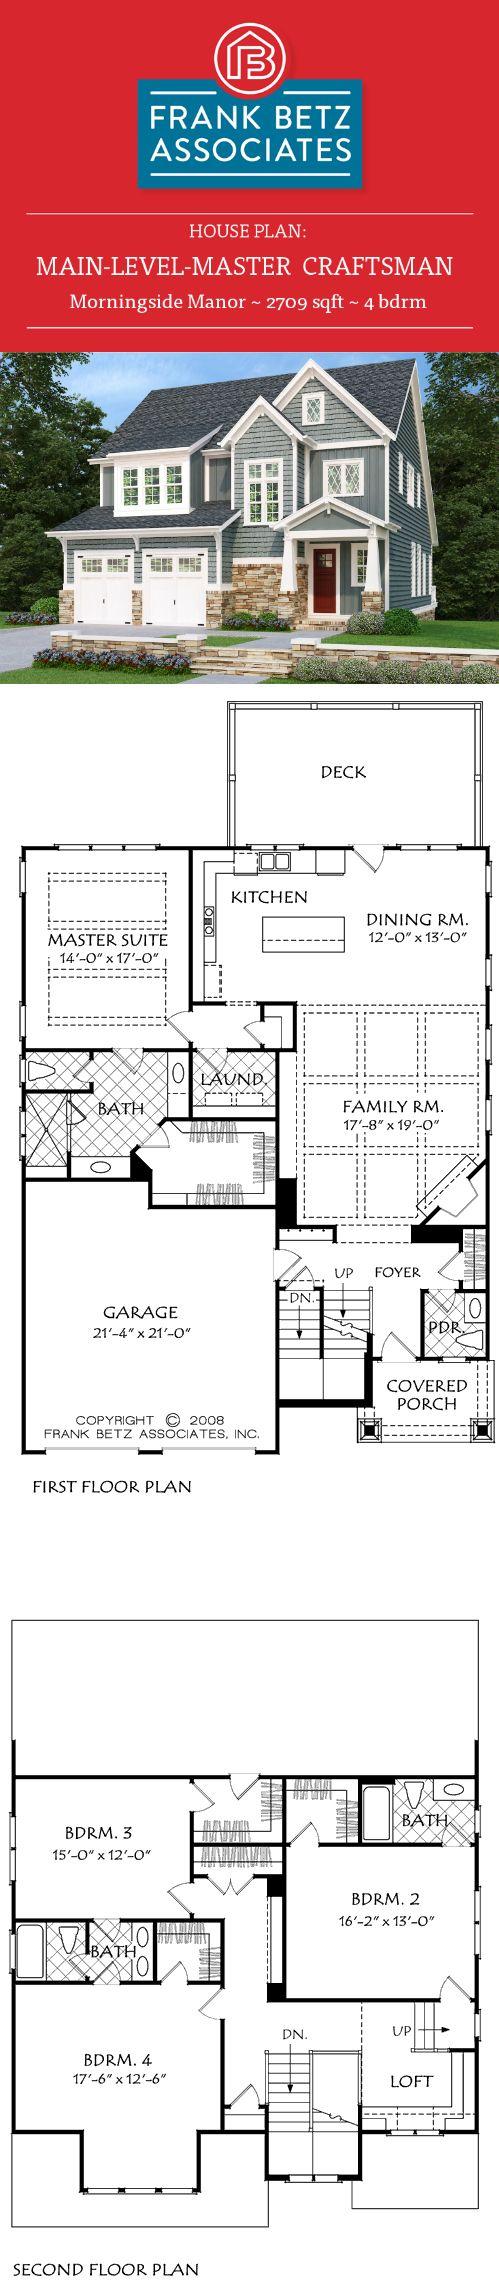 Morningside Manor: 2709 sqft, 4 bdrm, main-level-master, craftsman house plan design by Frank Betz Associates Inc.